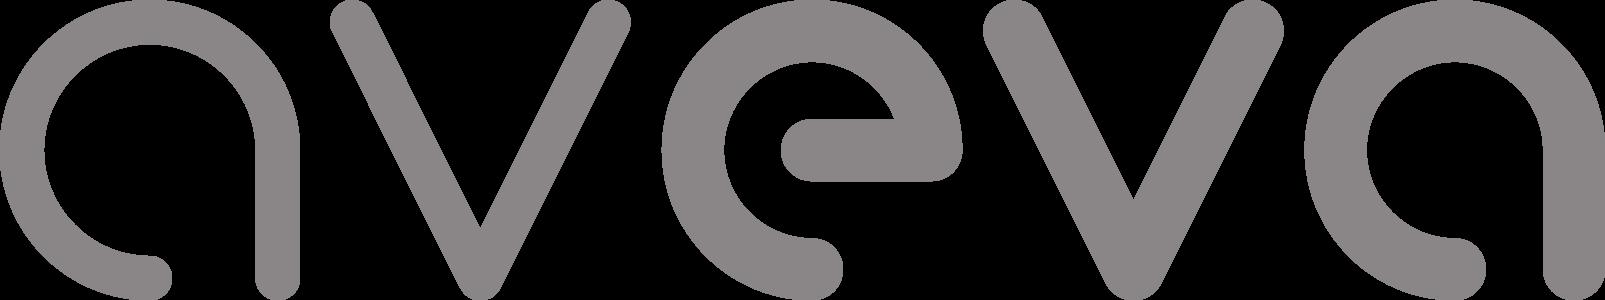 aveva design logo